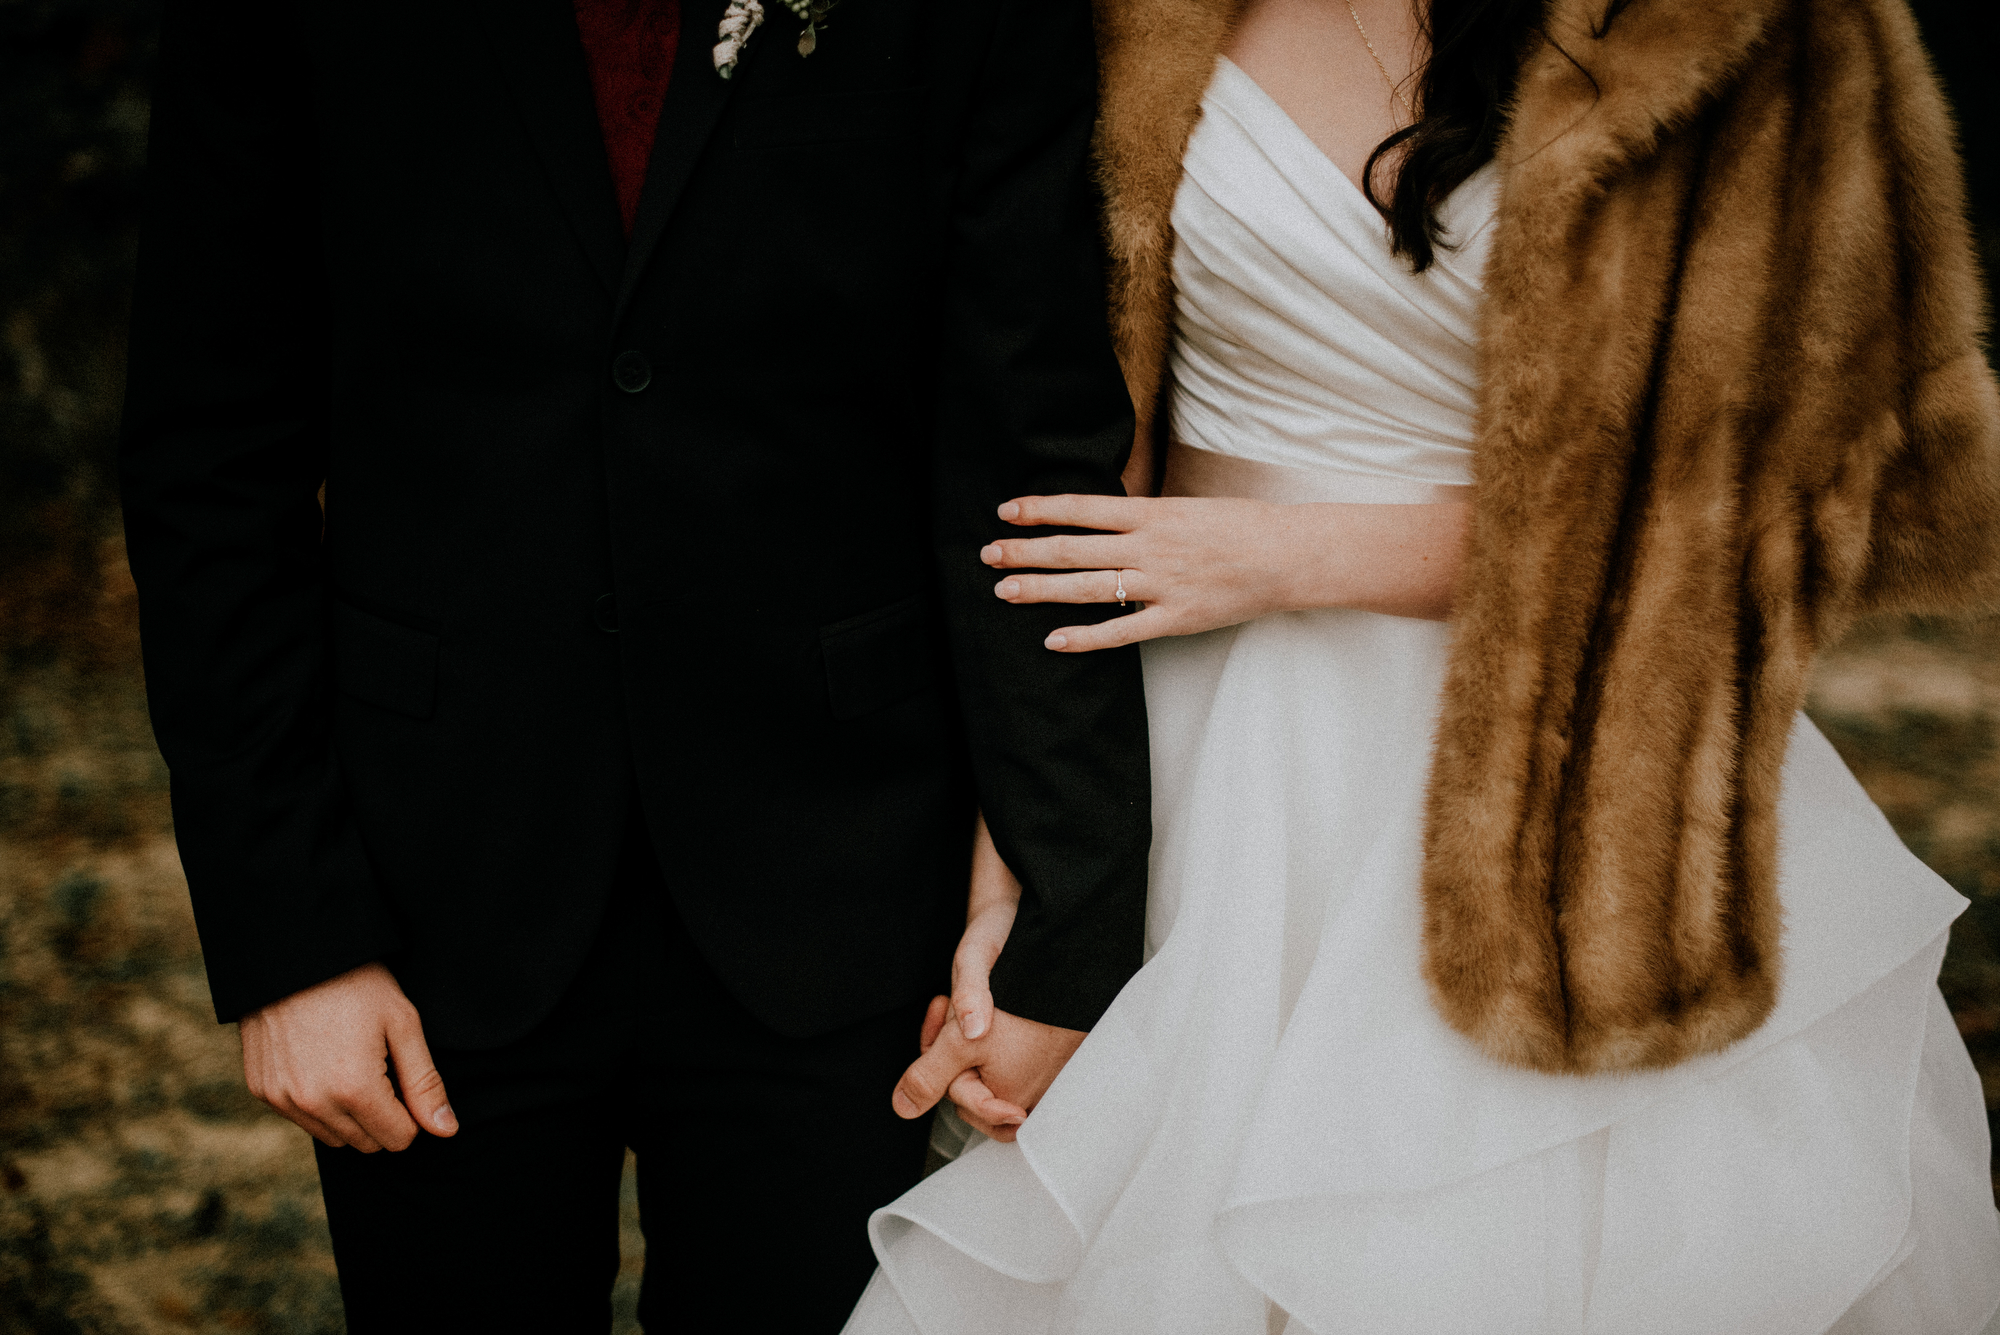 ofRen_weddingPhotos014.JPG